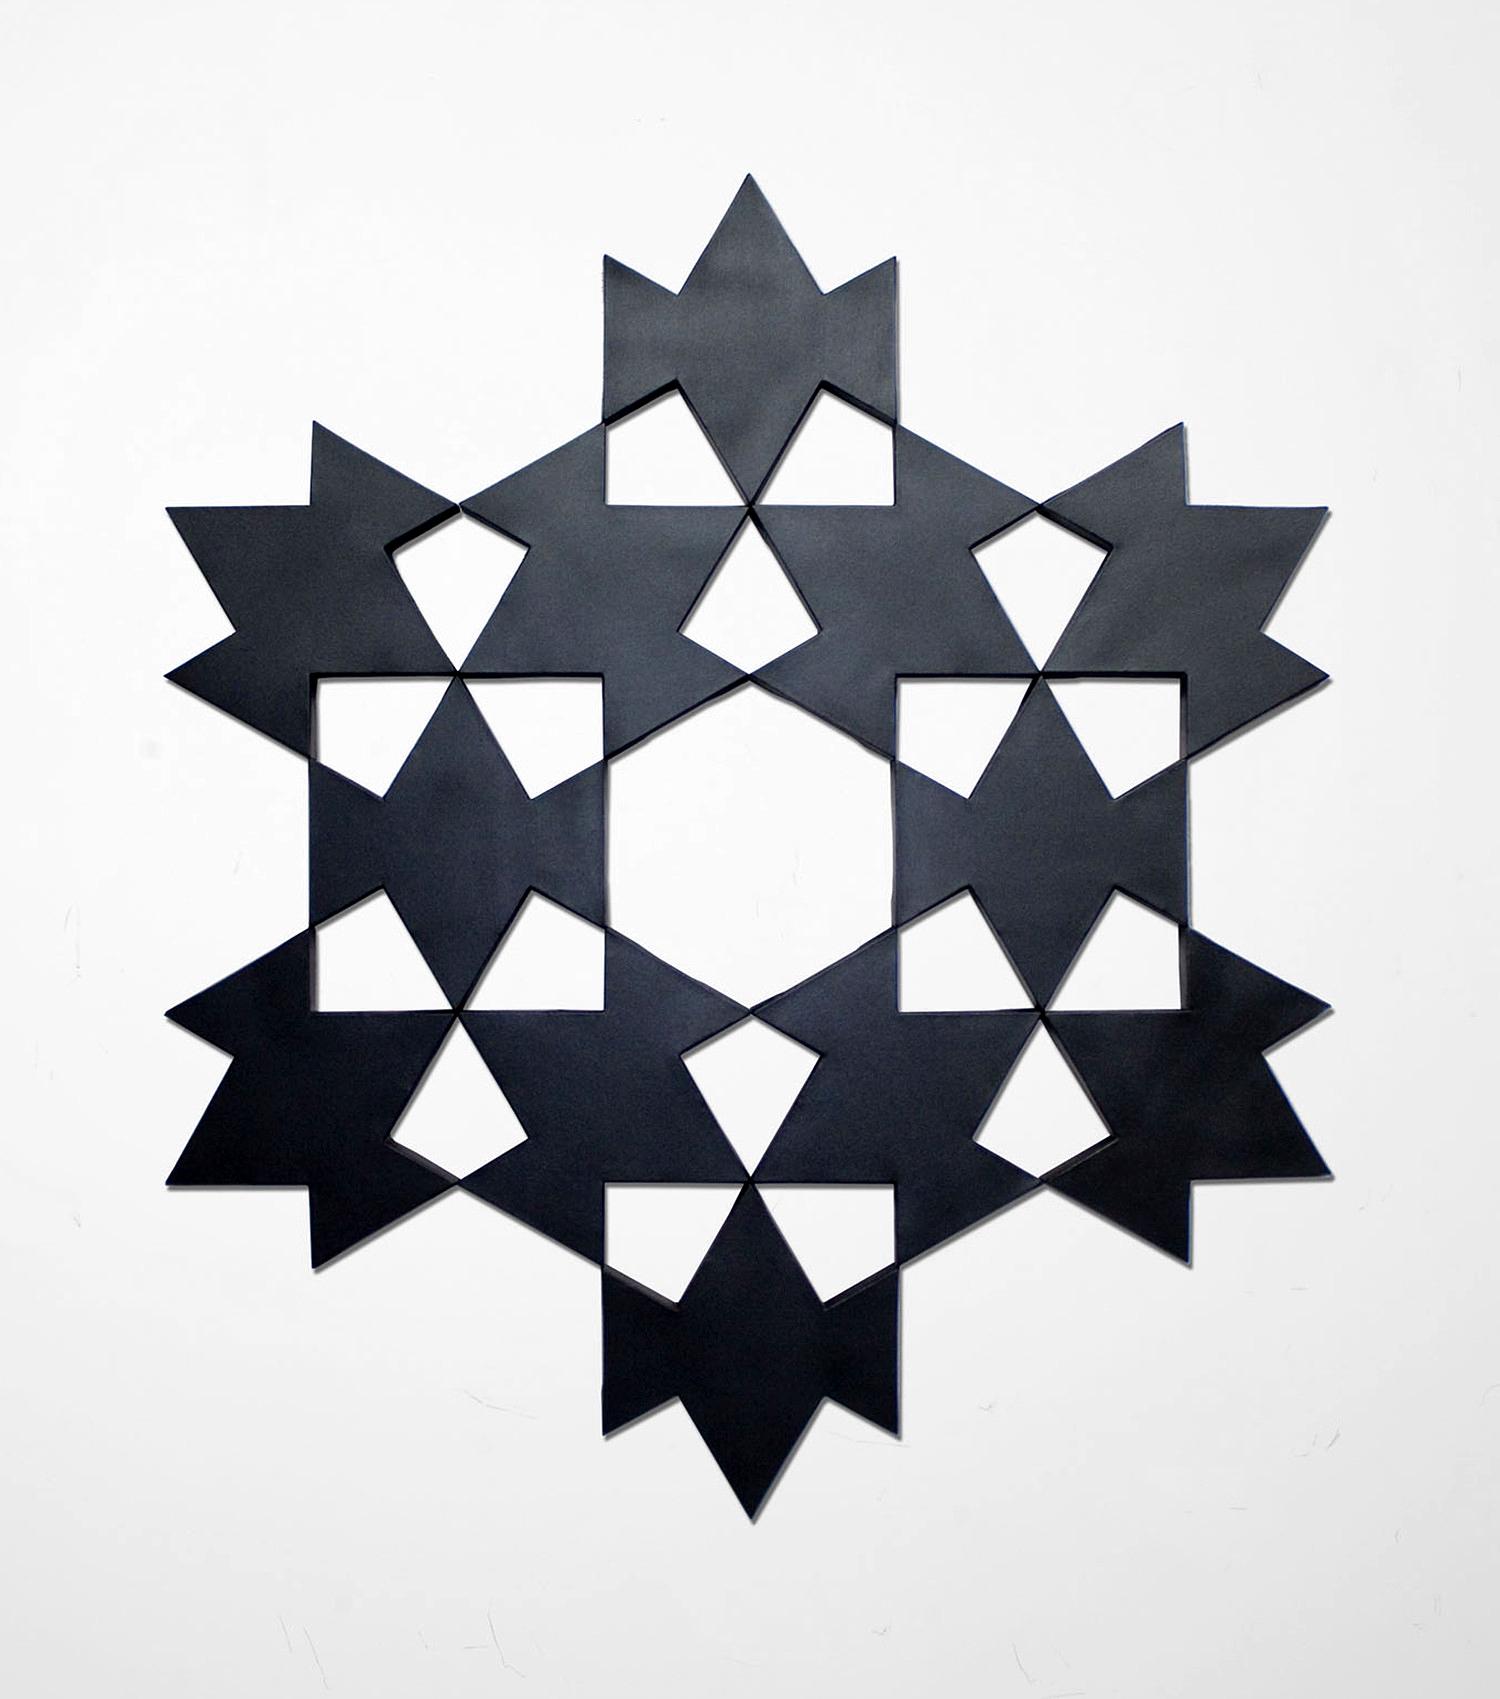 Mamluk II: Black Pearl   2010. Acrylic on 12 canvases. 62 x 72 in., 157.5 x 182.9 cm.